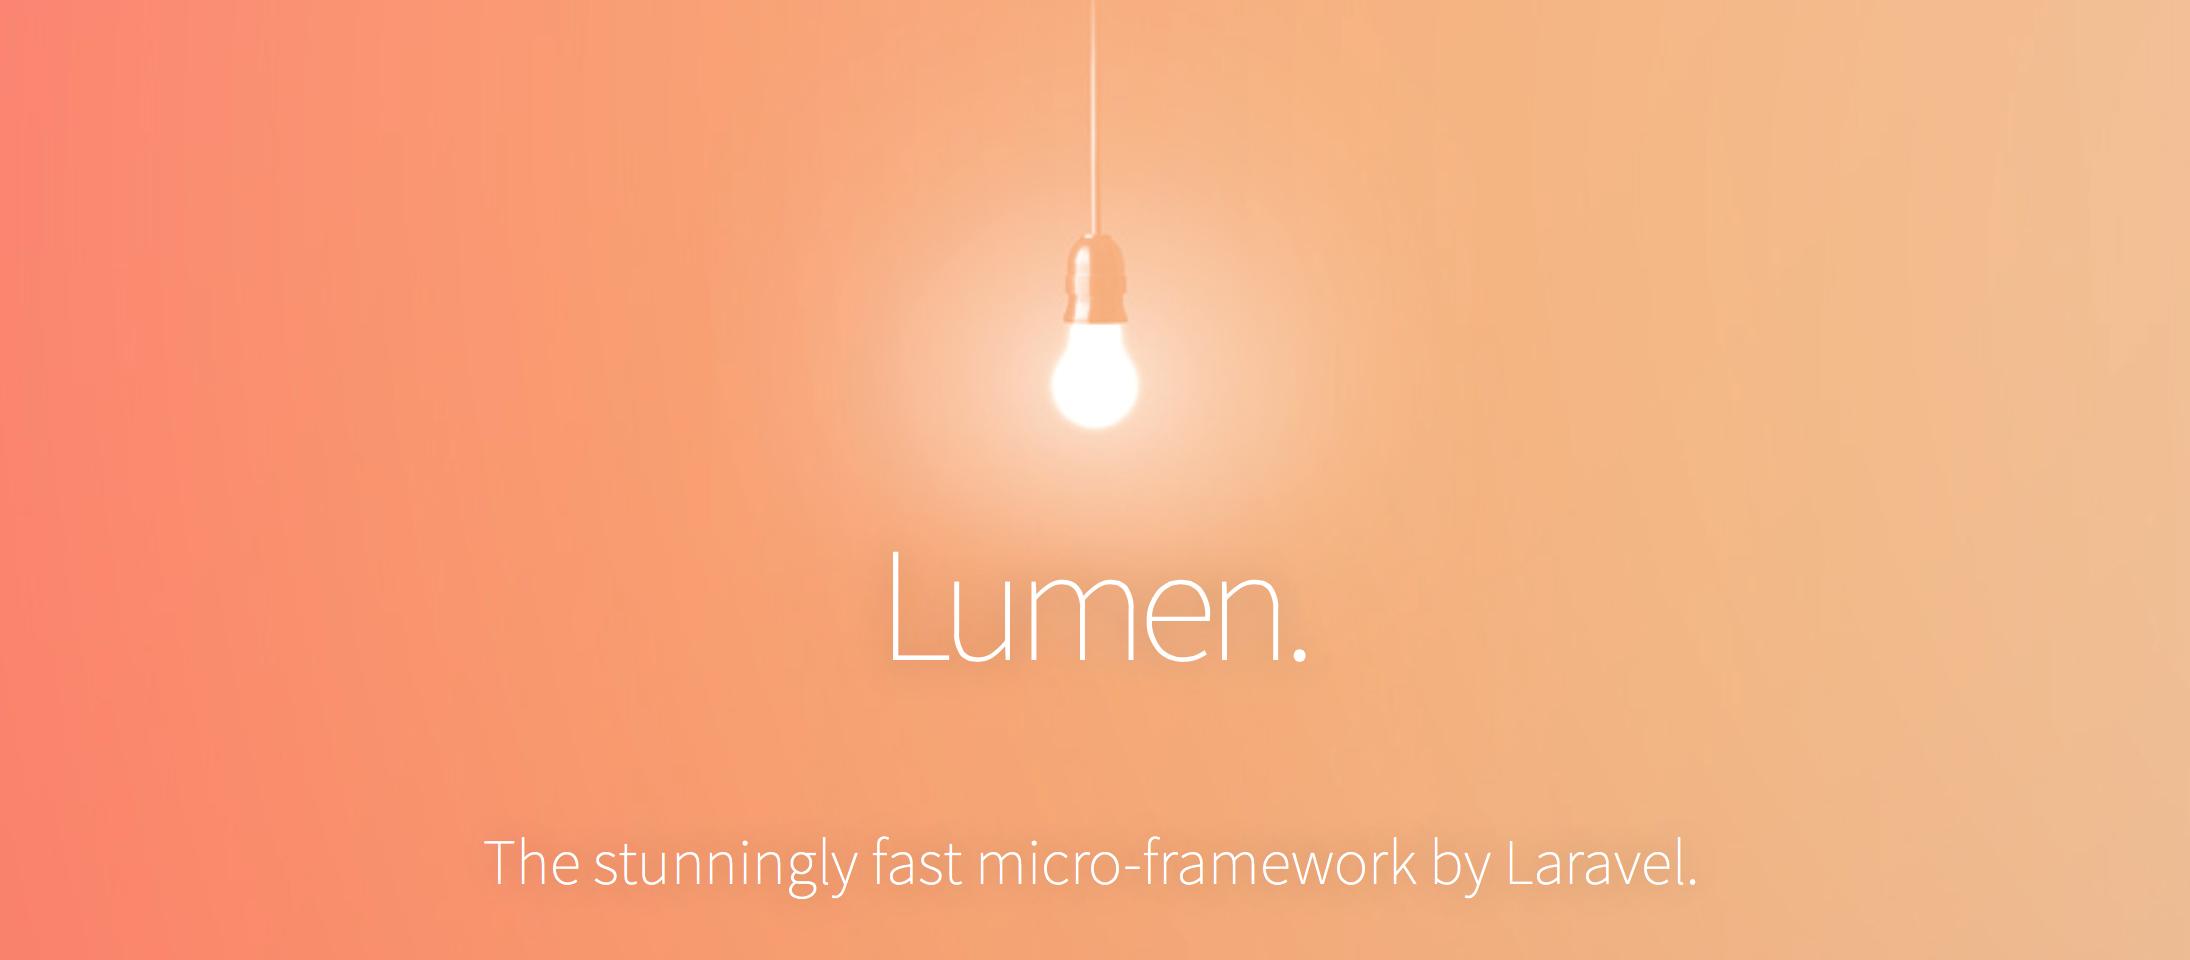 Lumen  - Screen Shot 2015 04 14 at 9 - Introducing Lumen from Laravel | MattStauffer.com